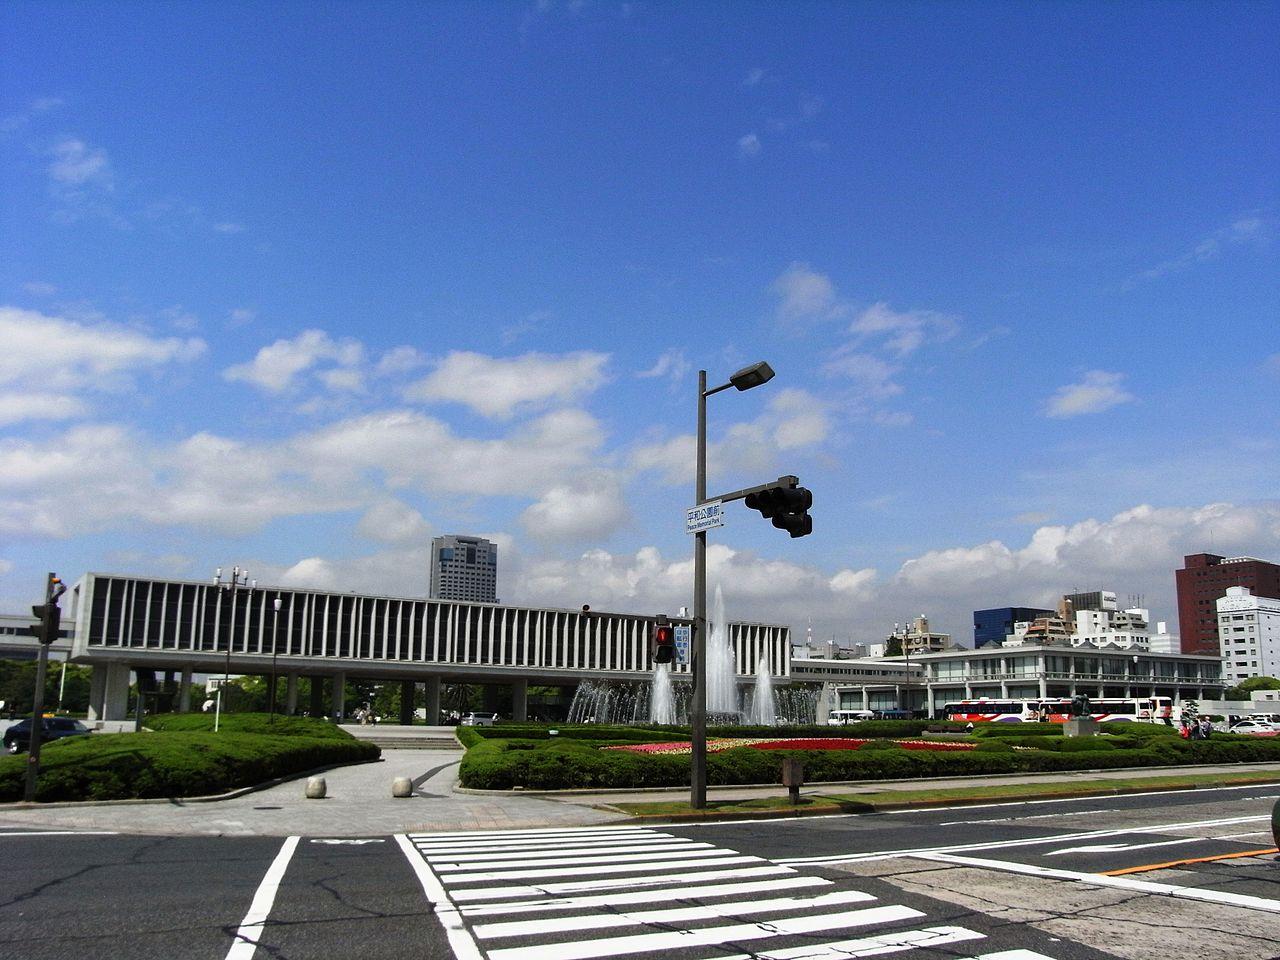 https://upload.wikimedia.org/wikipedia/commons/thumb/3/31/Hiroshima_Peace_Memorial_Museum_2008_01.JPG/1280px-Hiroshima_Peace_Memorial_Museum_2008_01.JPG